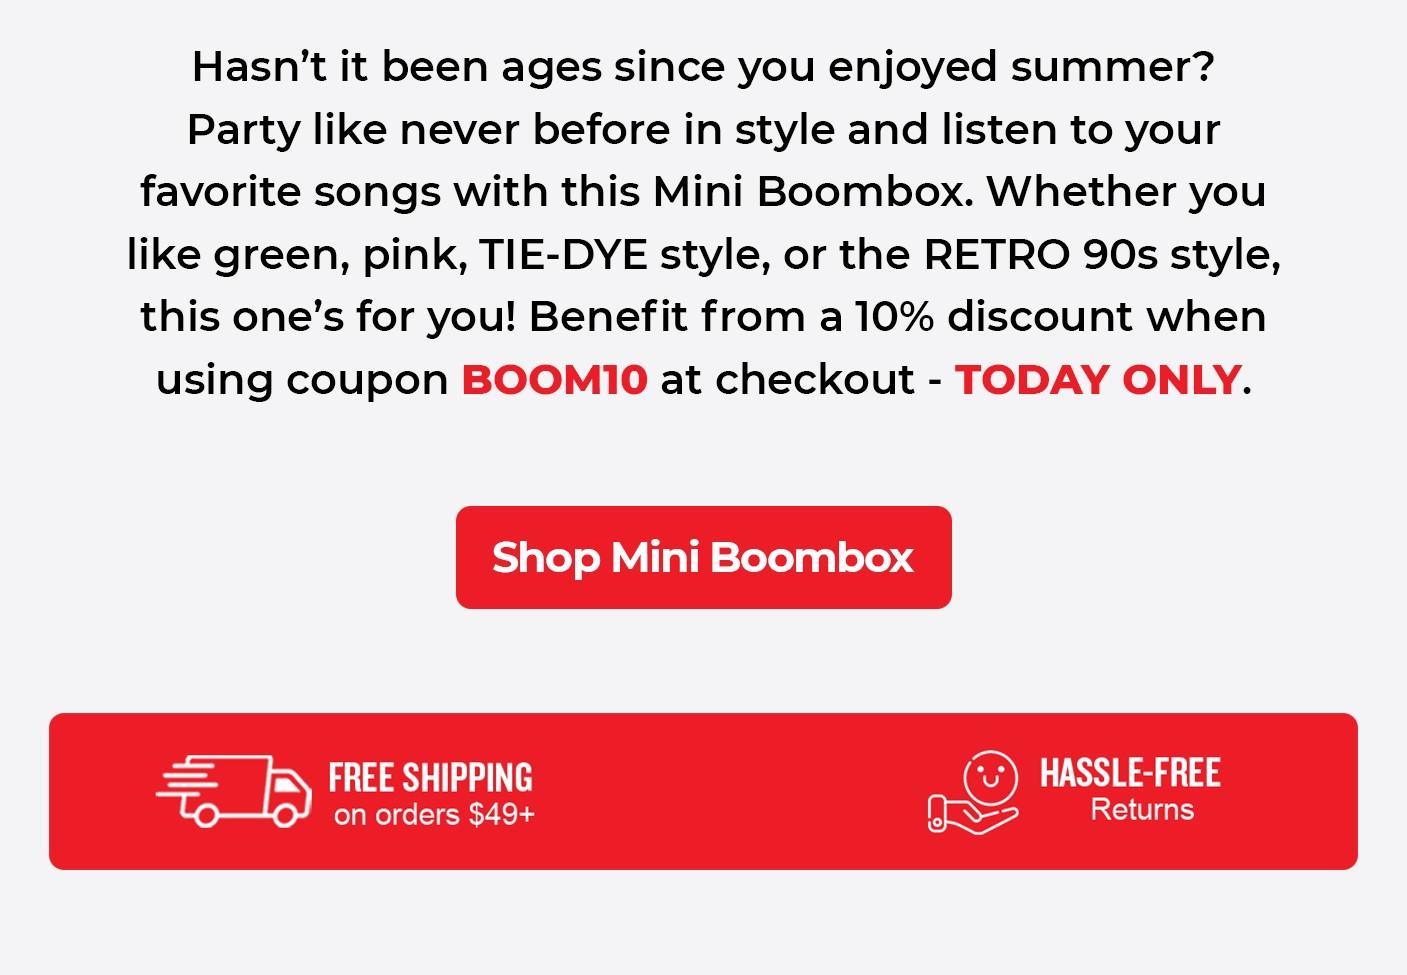 Shop Mini Boombox